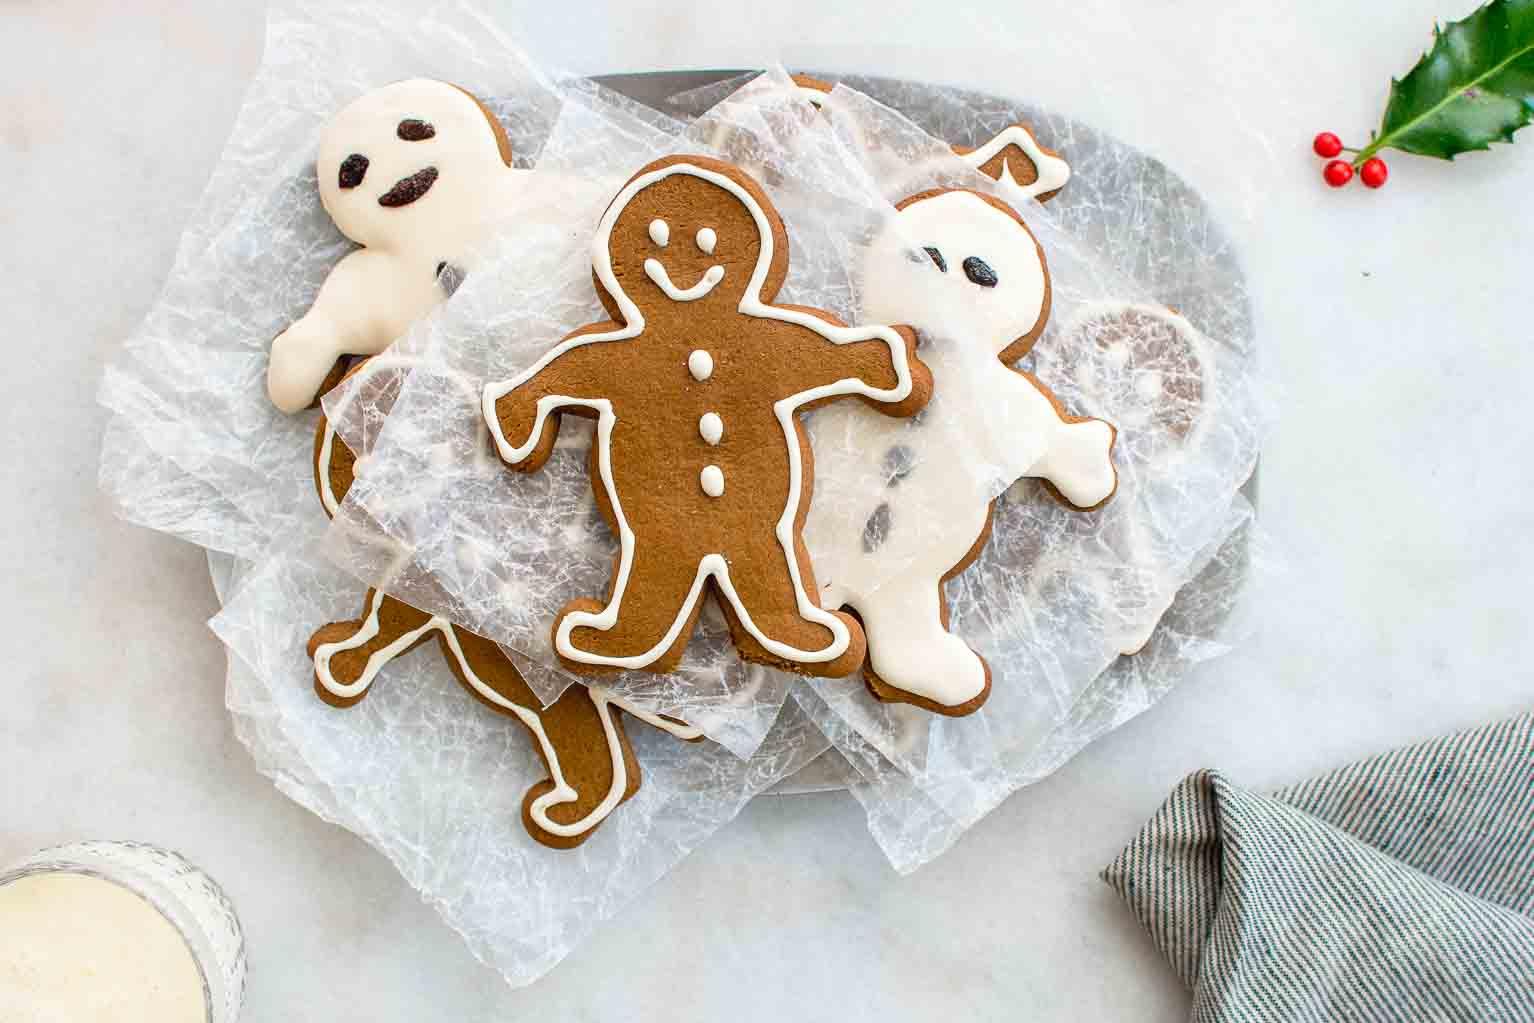 Maple gingerbread men ready for Santa Claus.